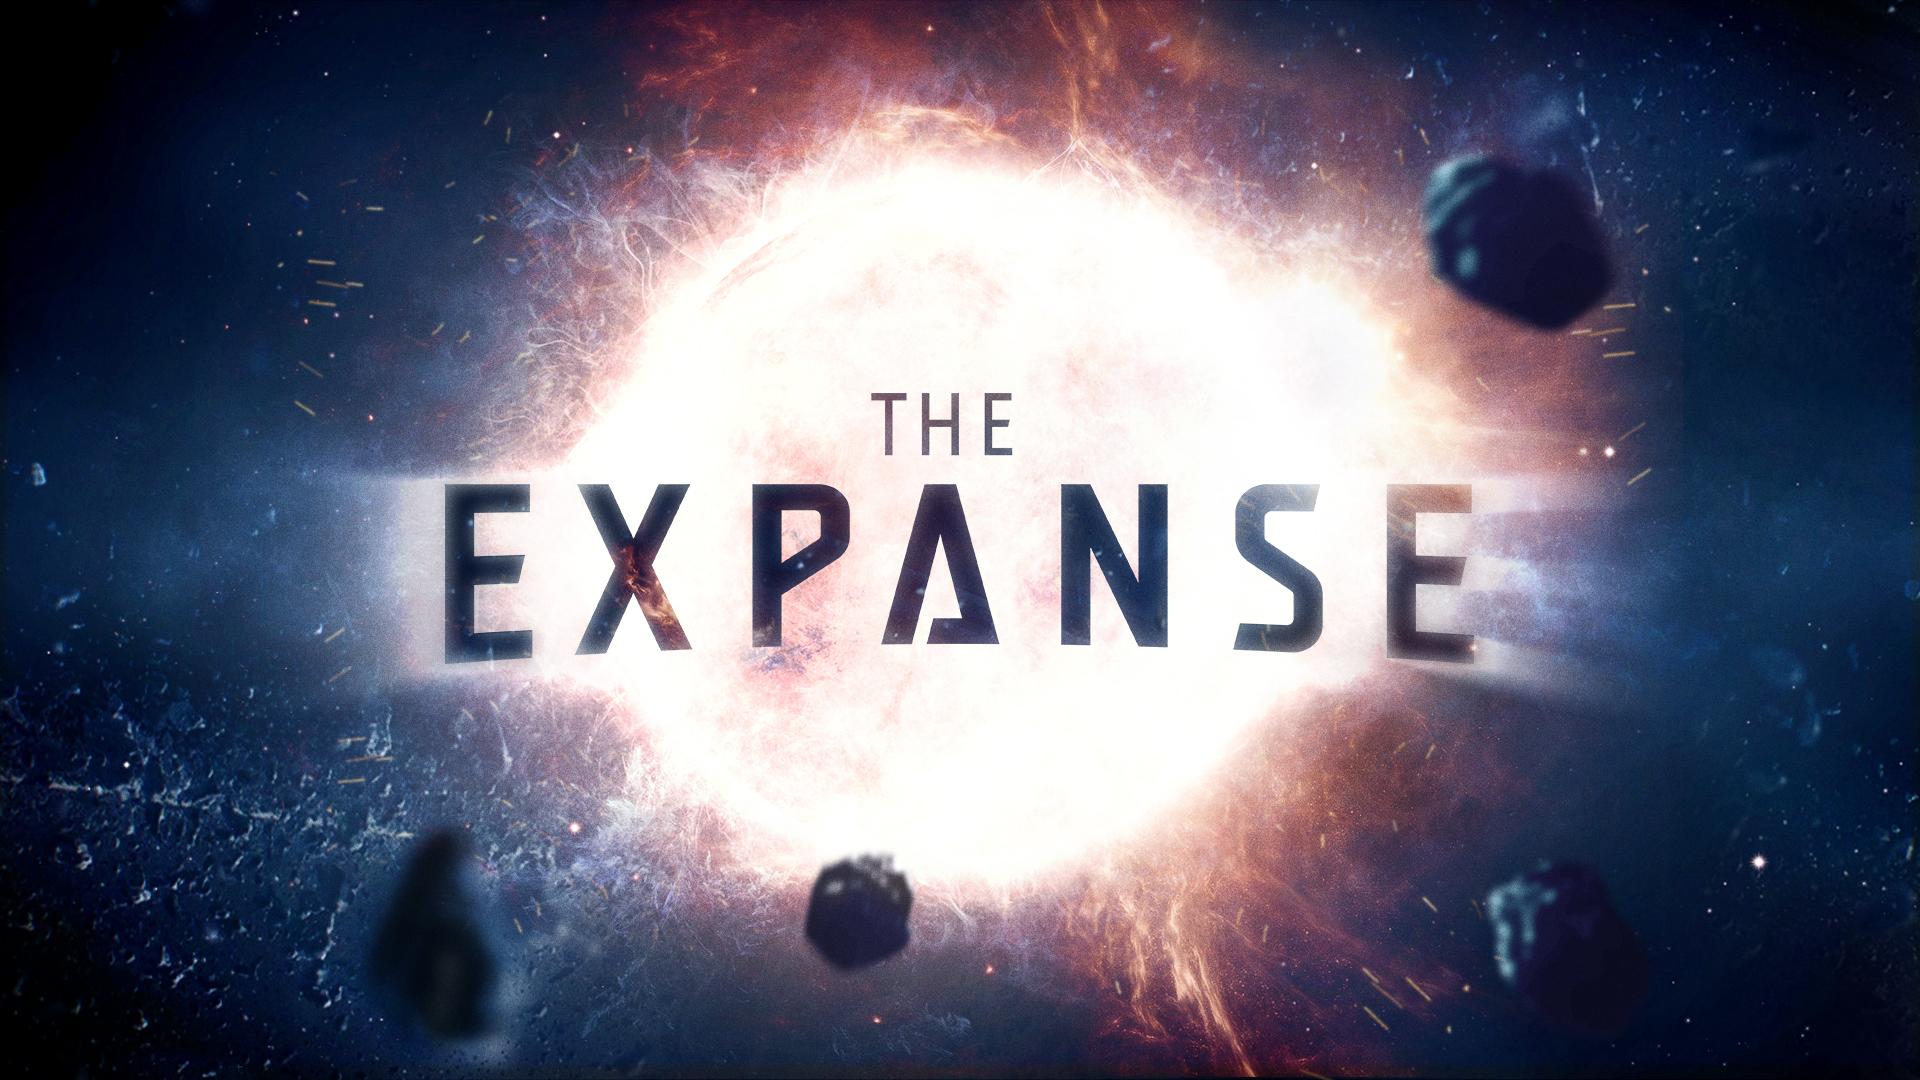 Znalezione obrazy dla zapytania expanse season 2